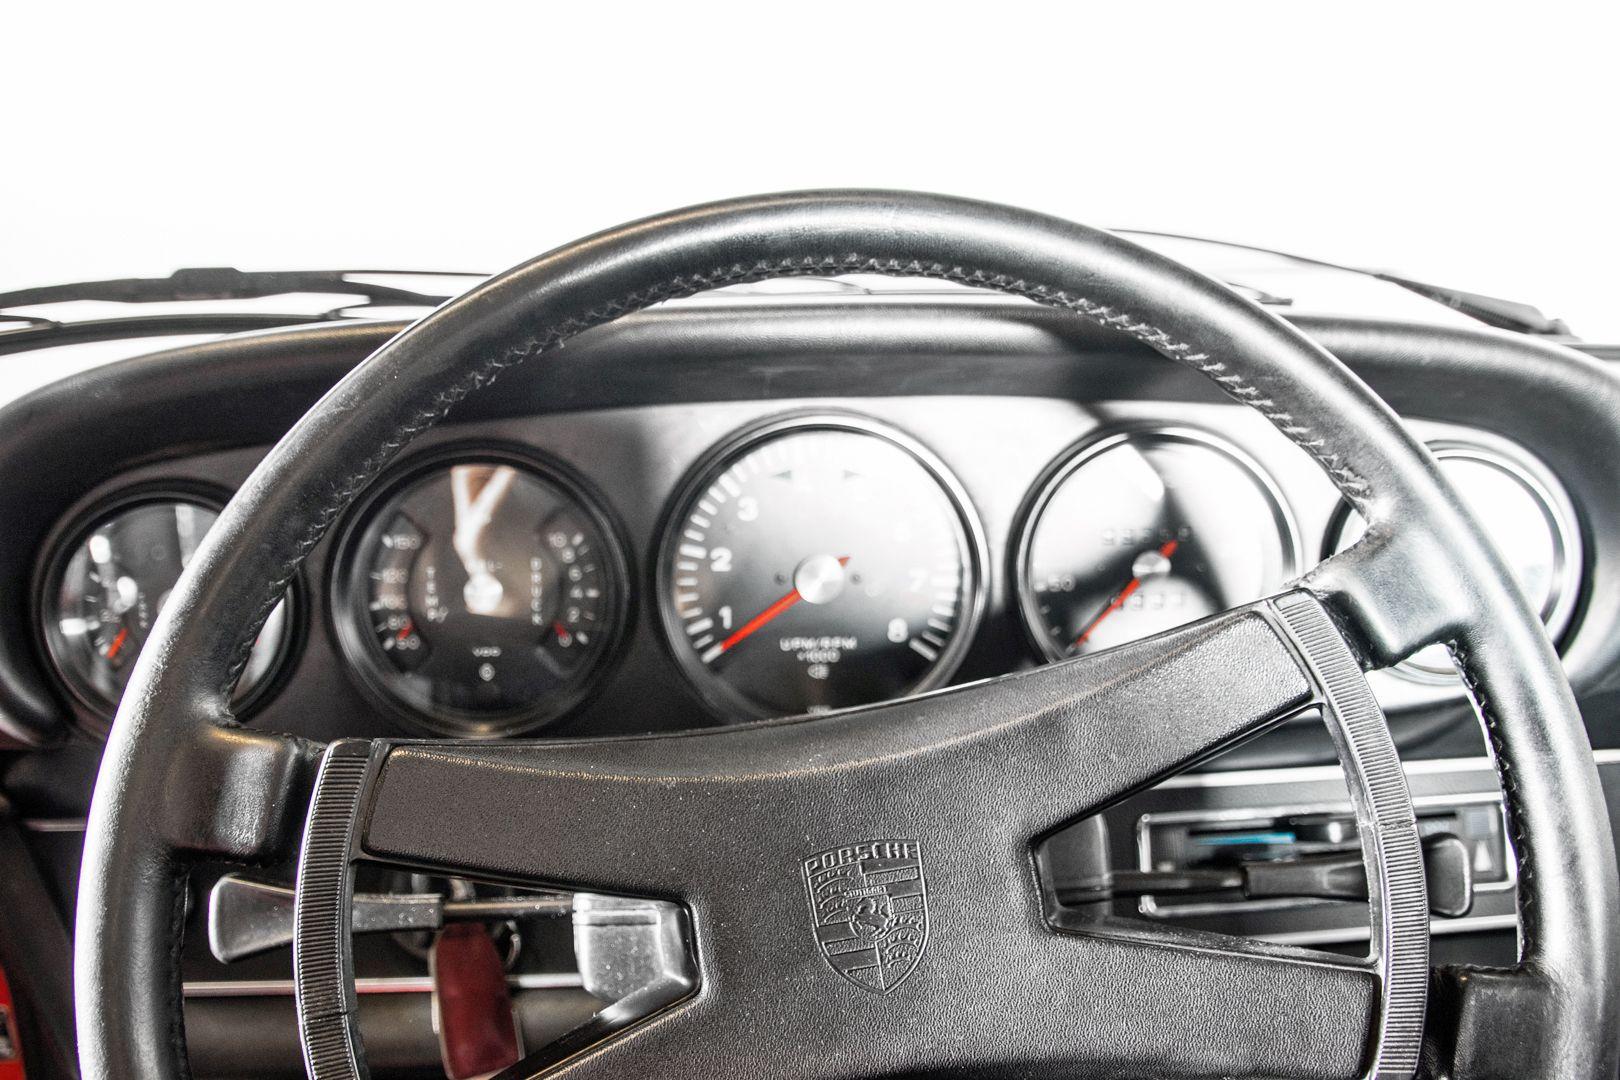 1973 Porsche 911 Carrera 2.7 RS 44408